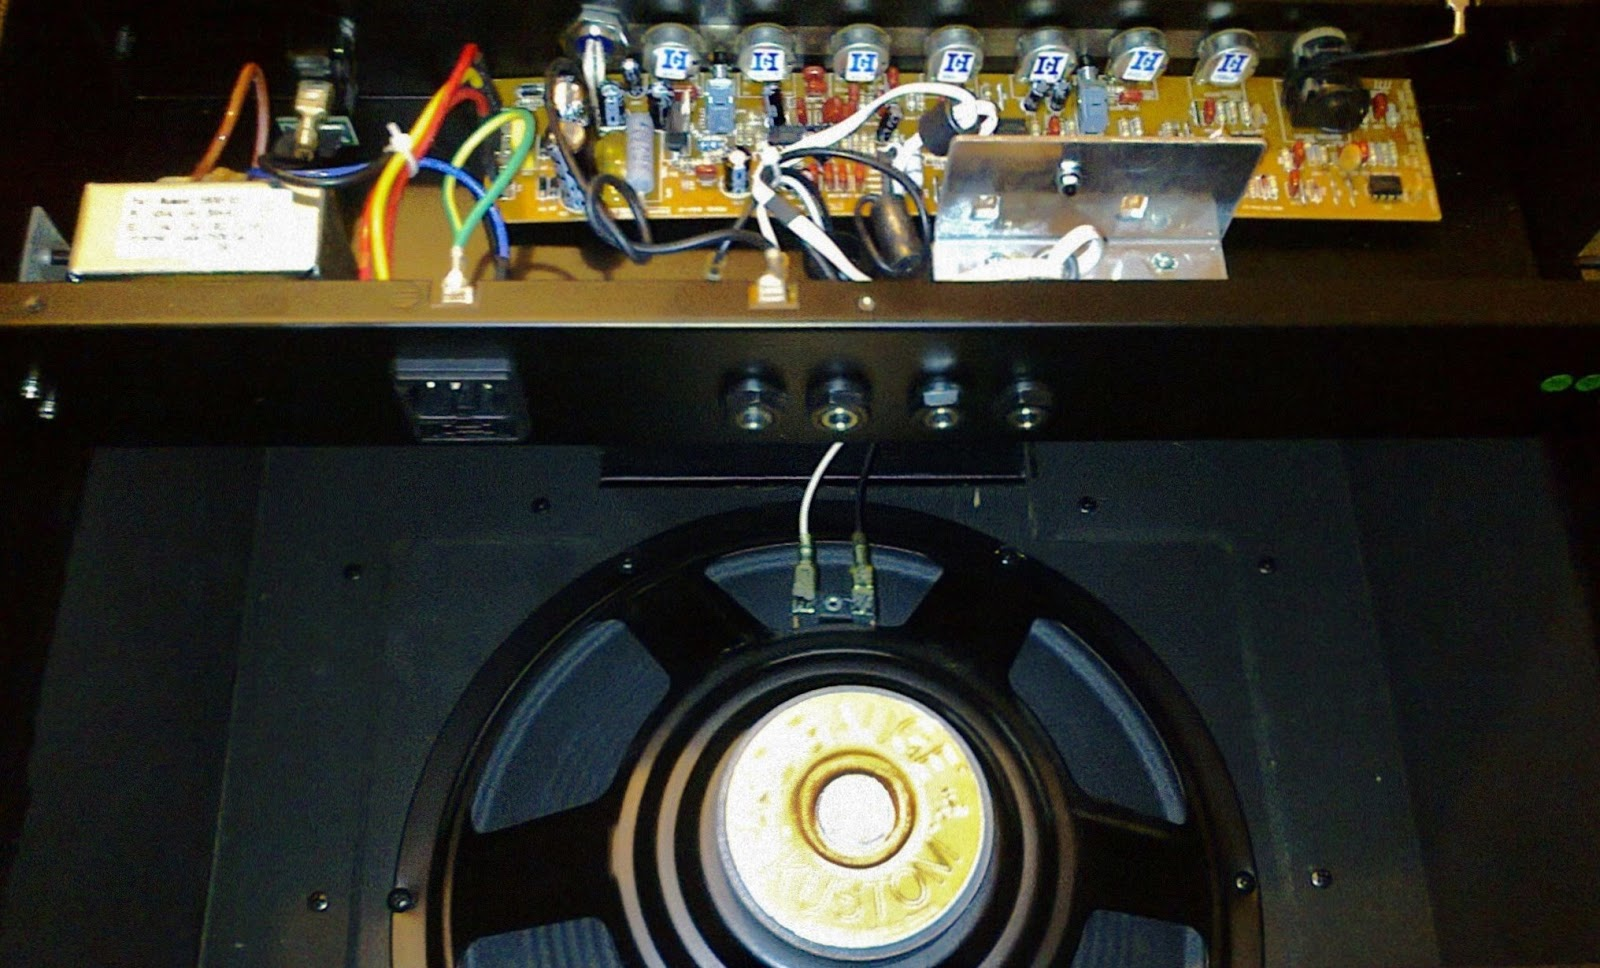 hight resolution of kustom 12 gauge amplifier mod guitar dreamer cheers